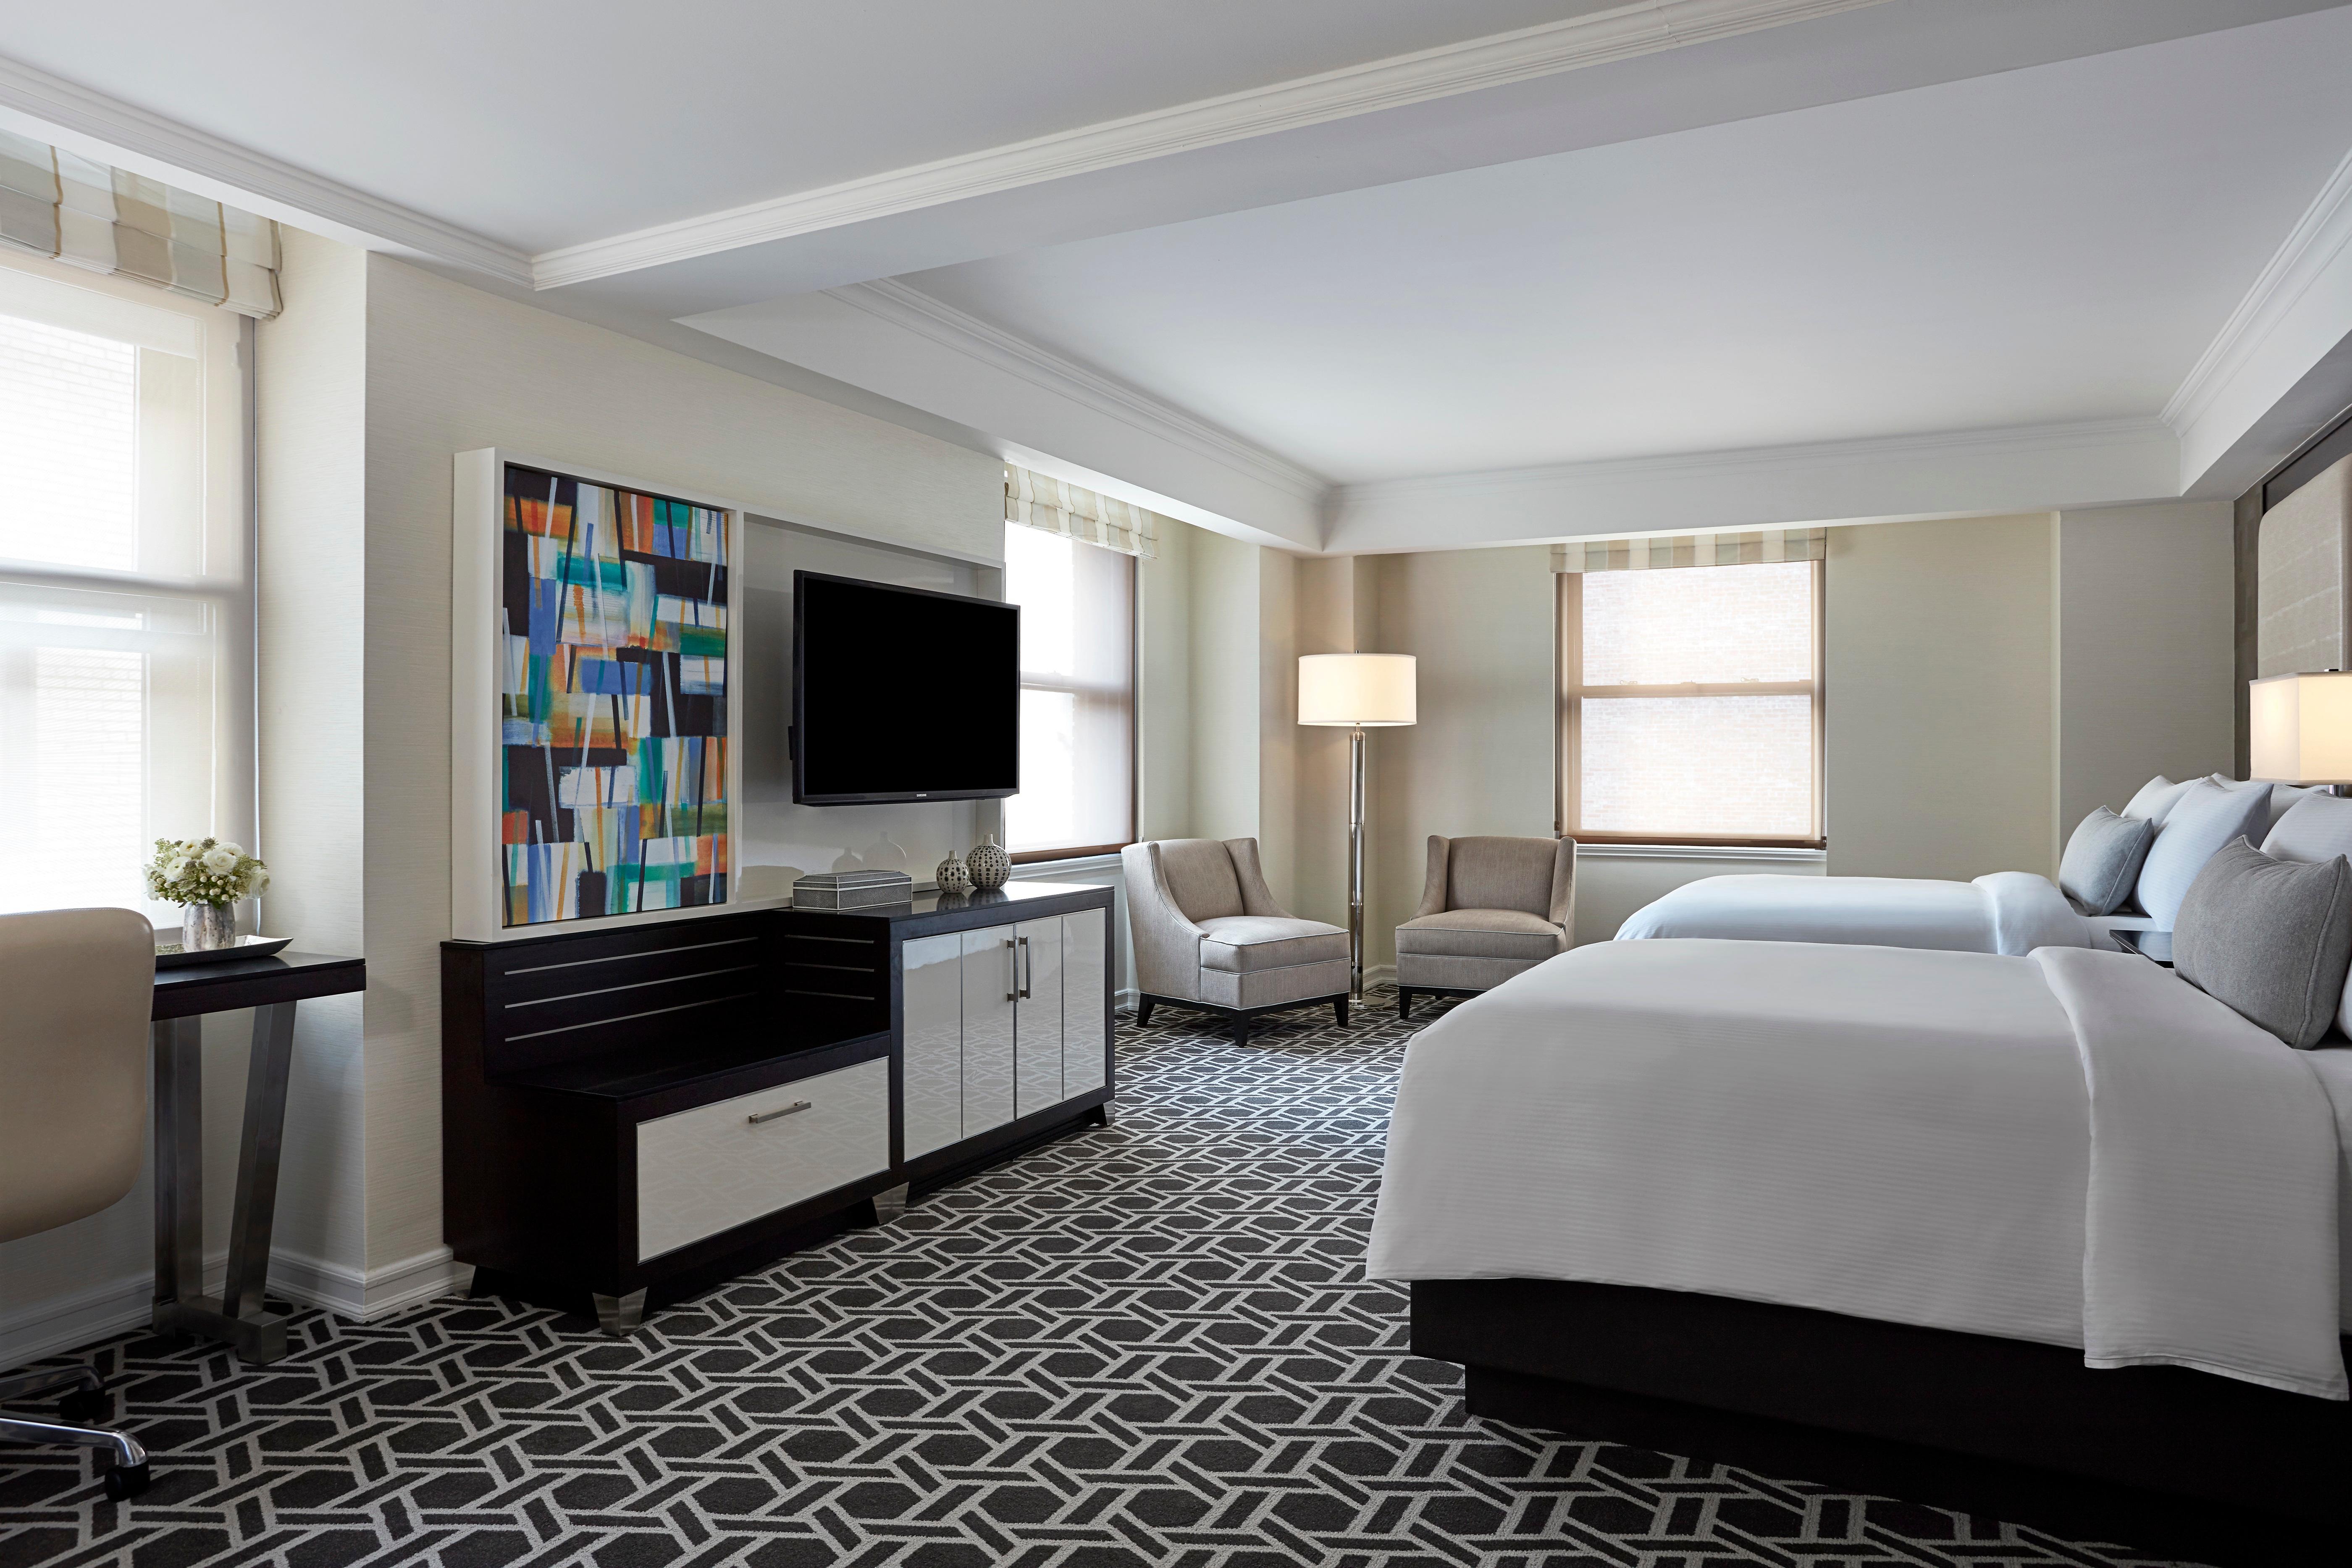 JW Marriott Essex House New York Hotel, New York City